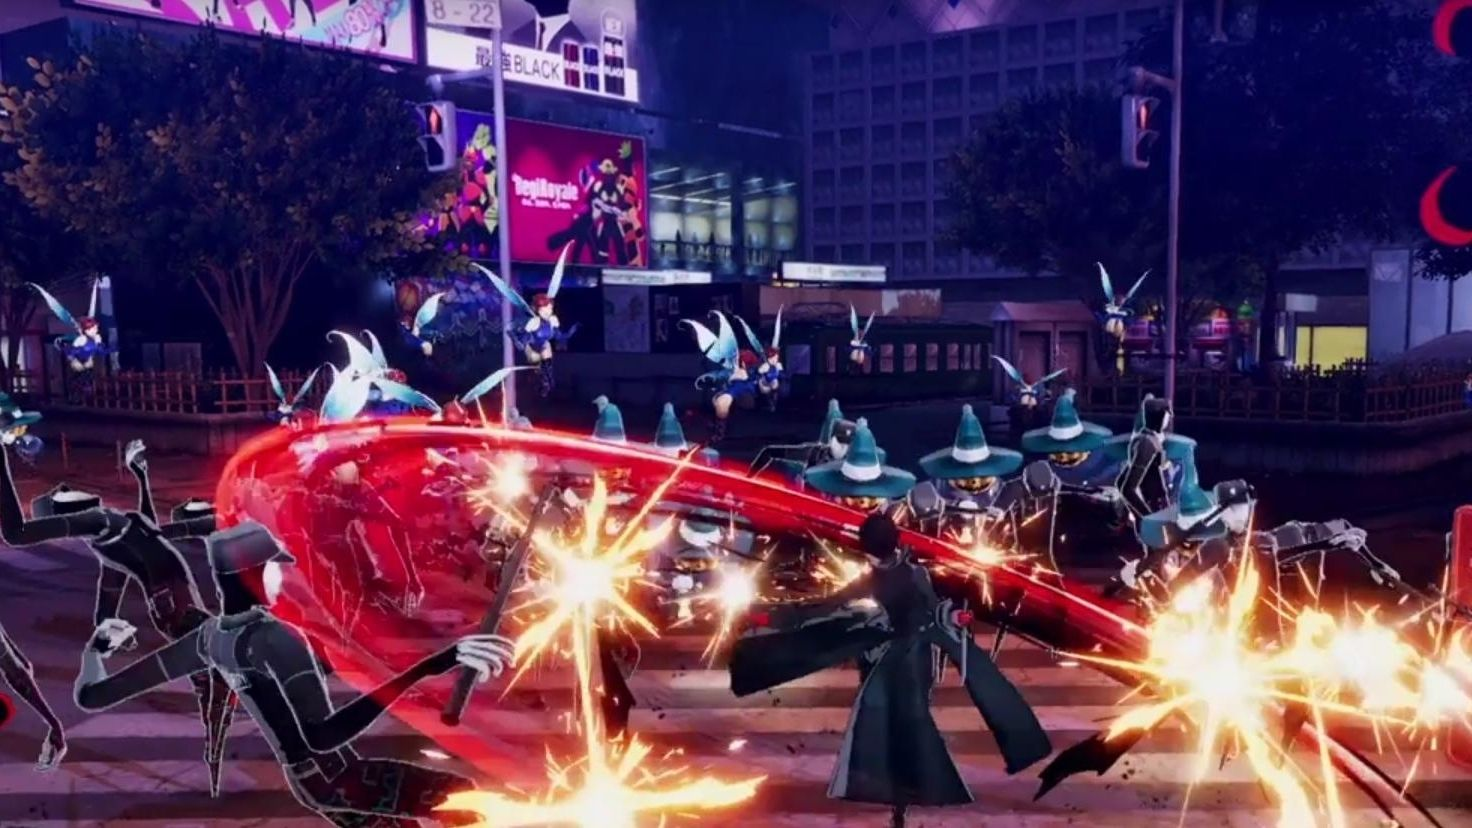 Anunciado Persona 5 Scramble: The Phantom Strikers para Nintendo Switch